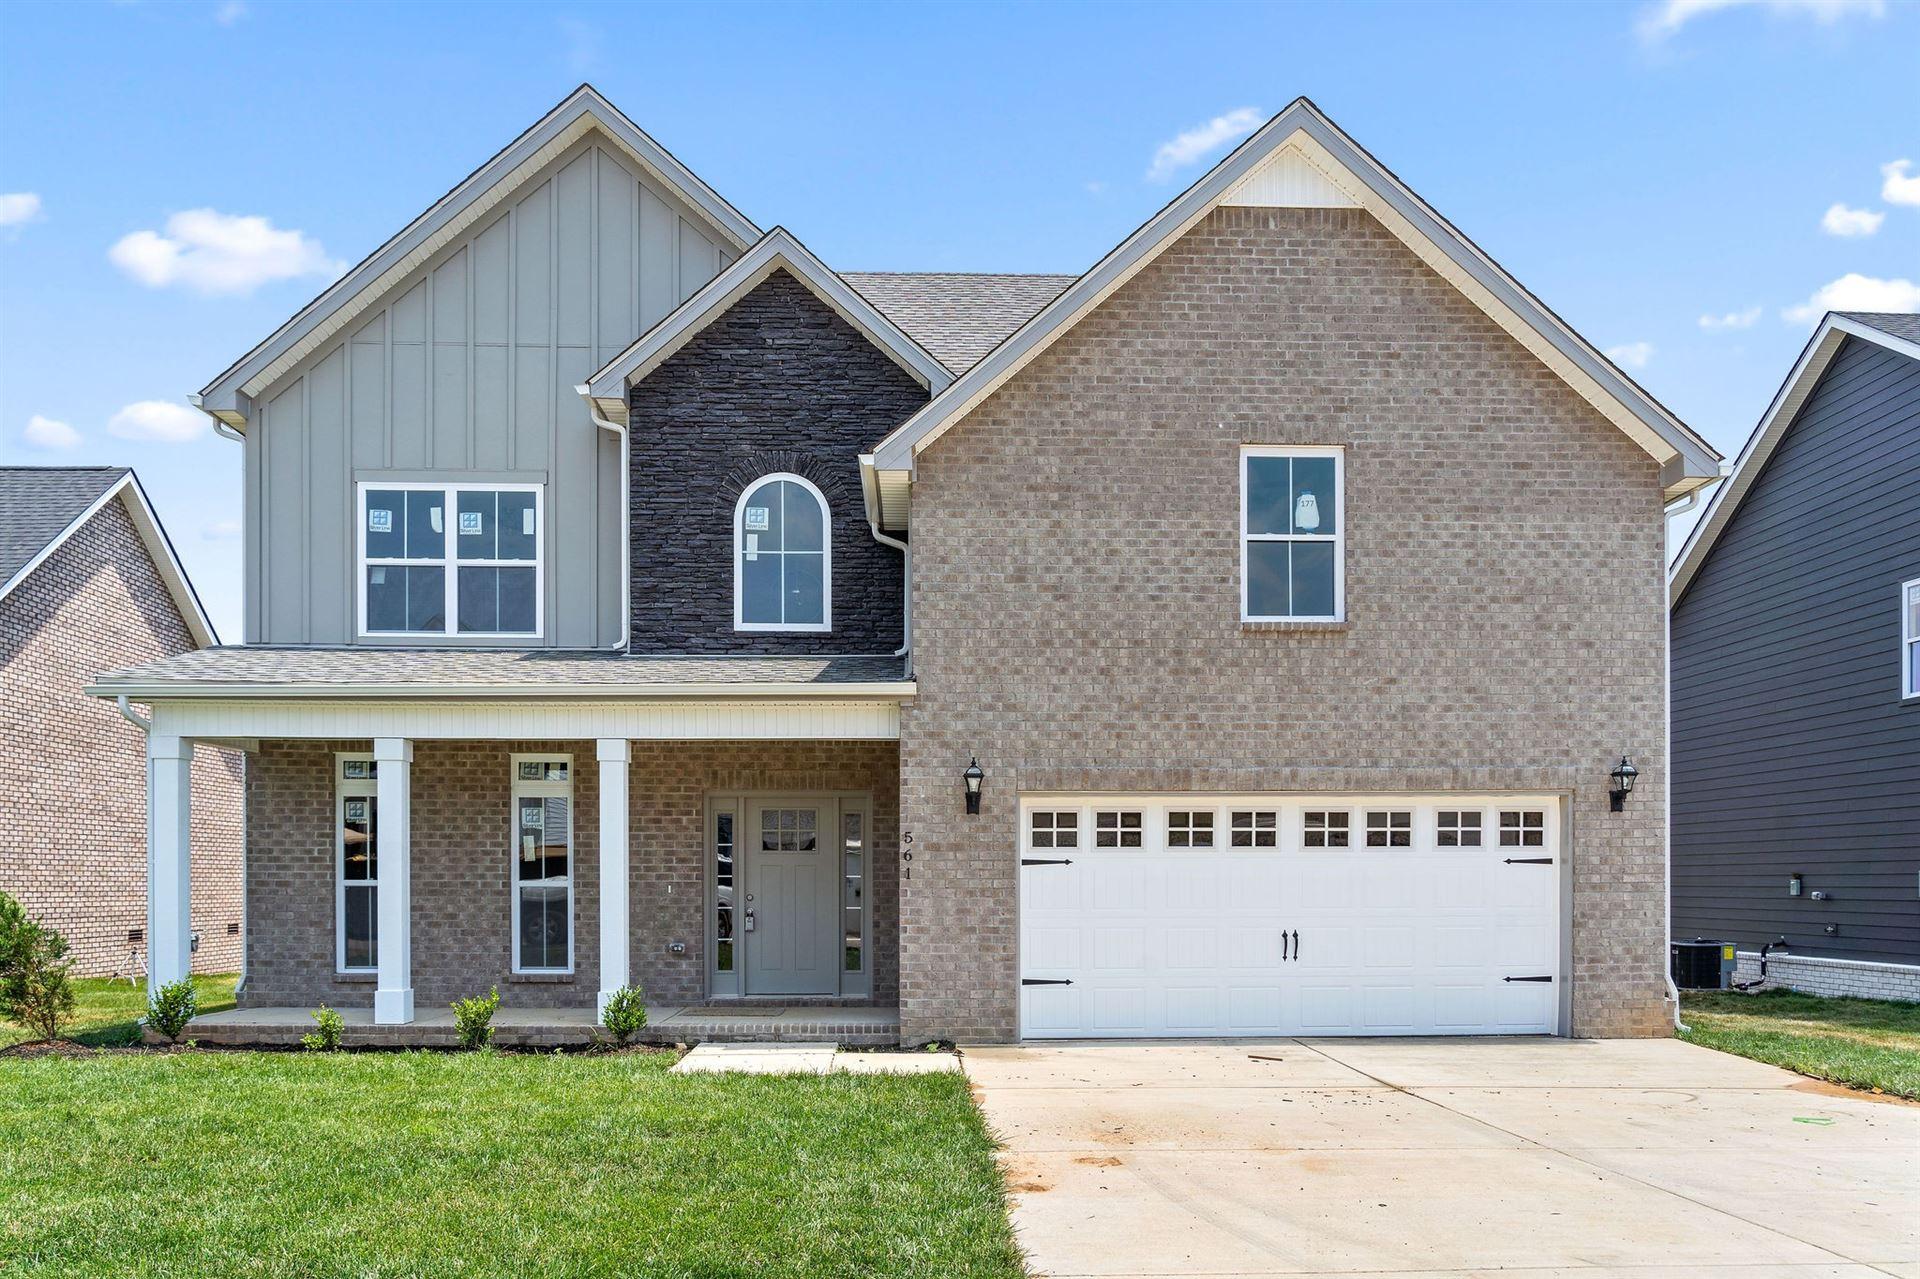 561 Dexter Drive, Clarksville, TN 37043 - MLS#: 2251727